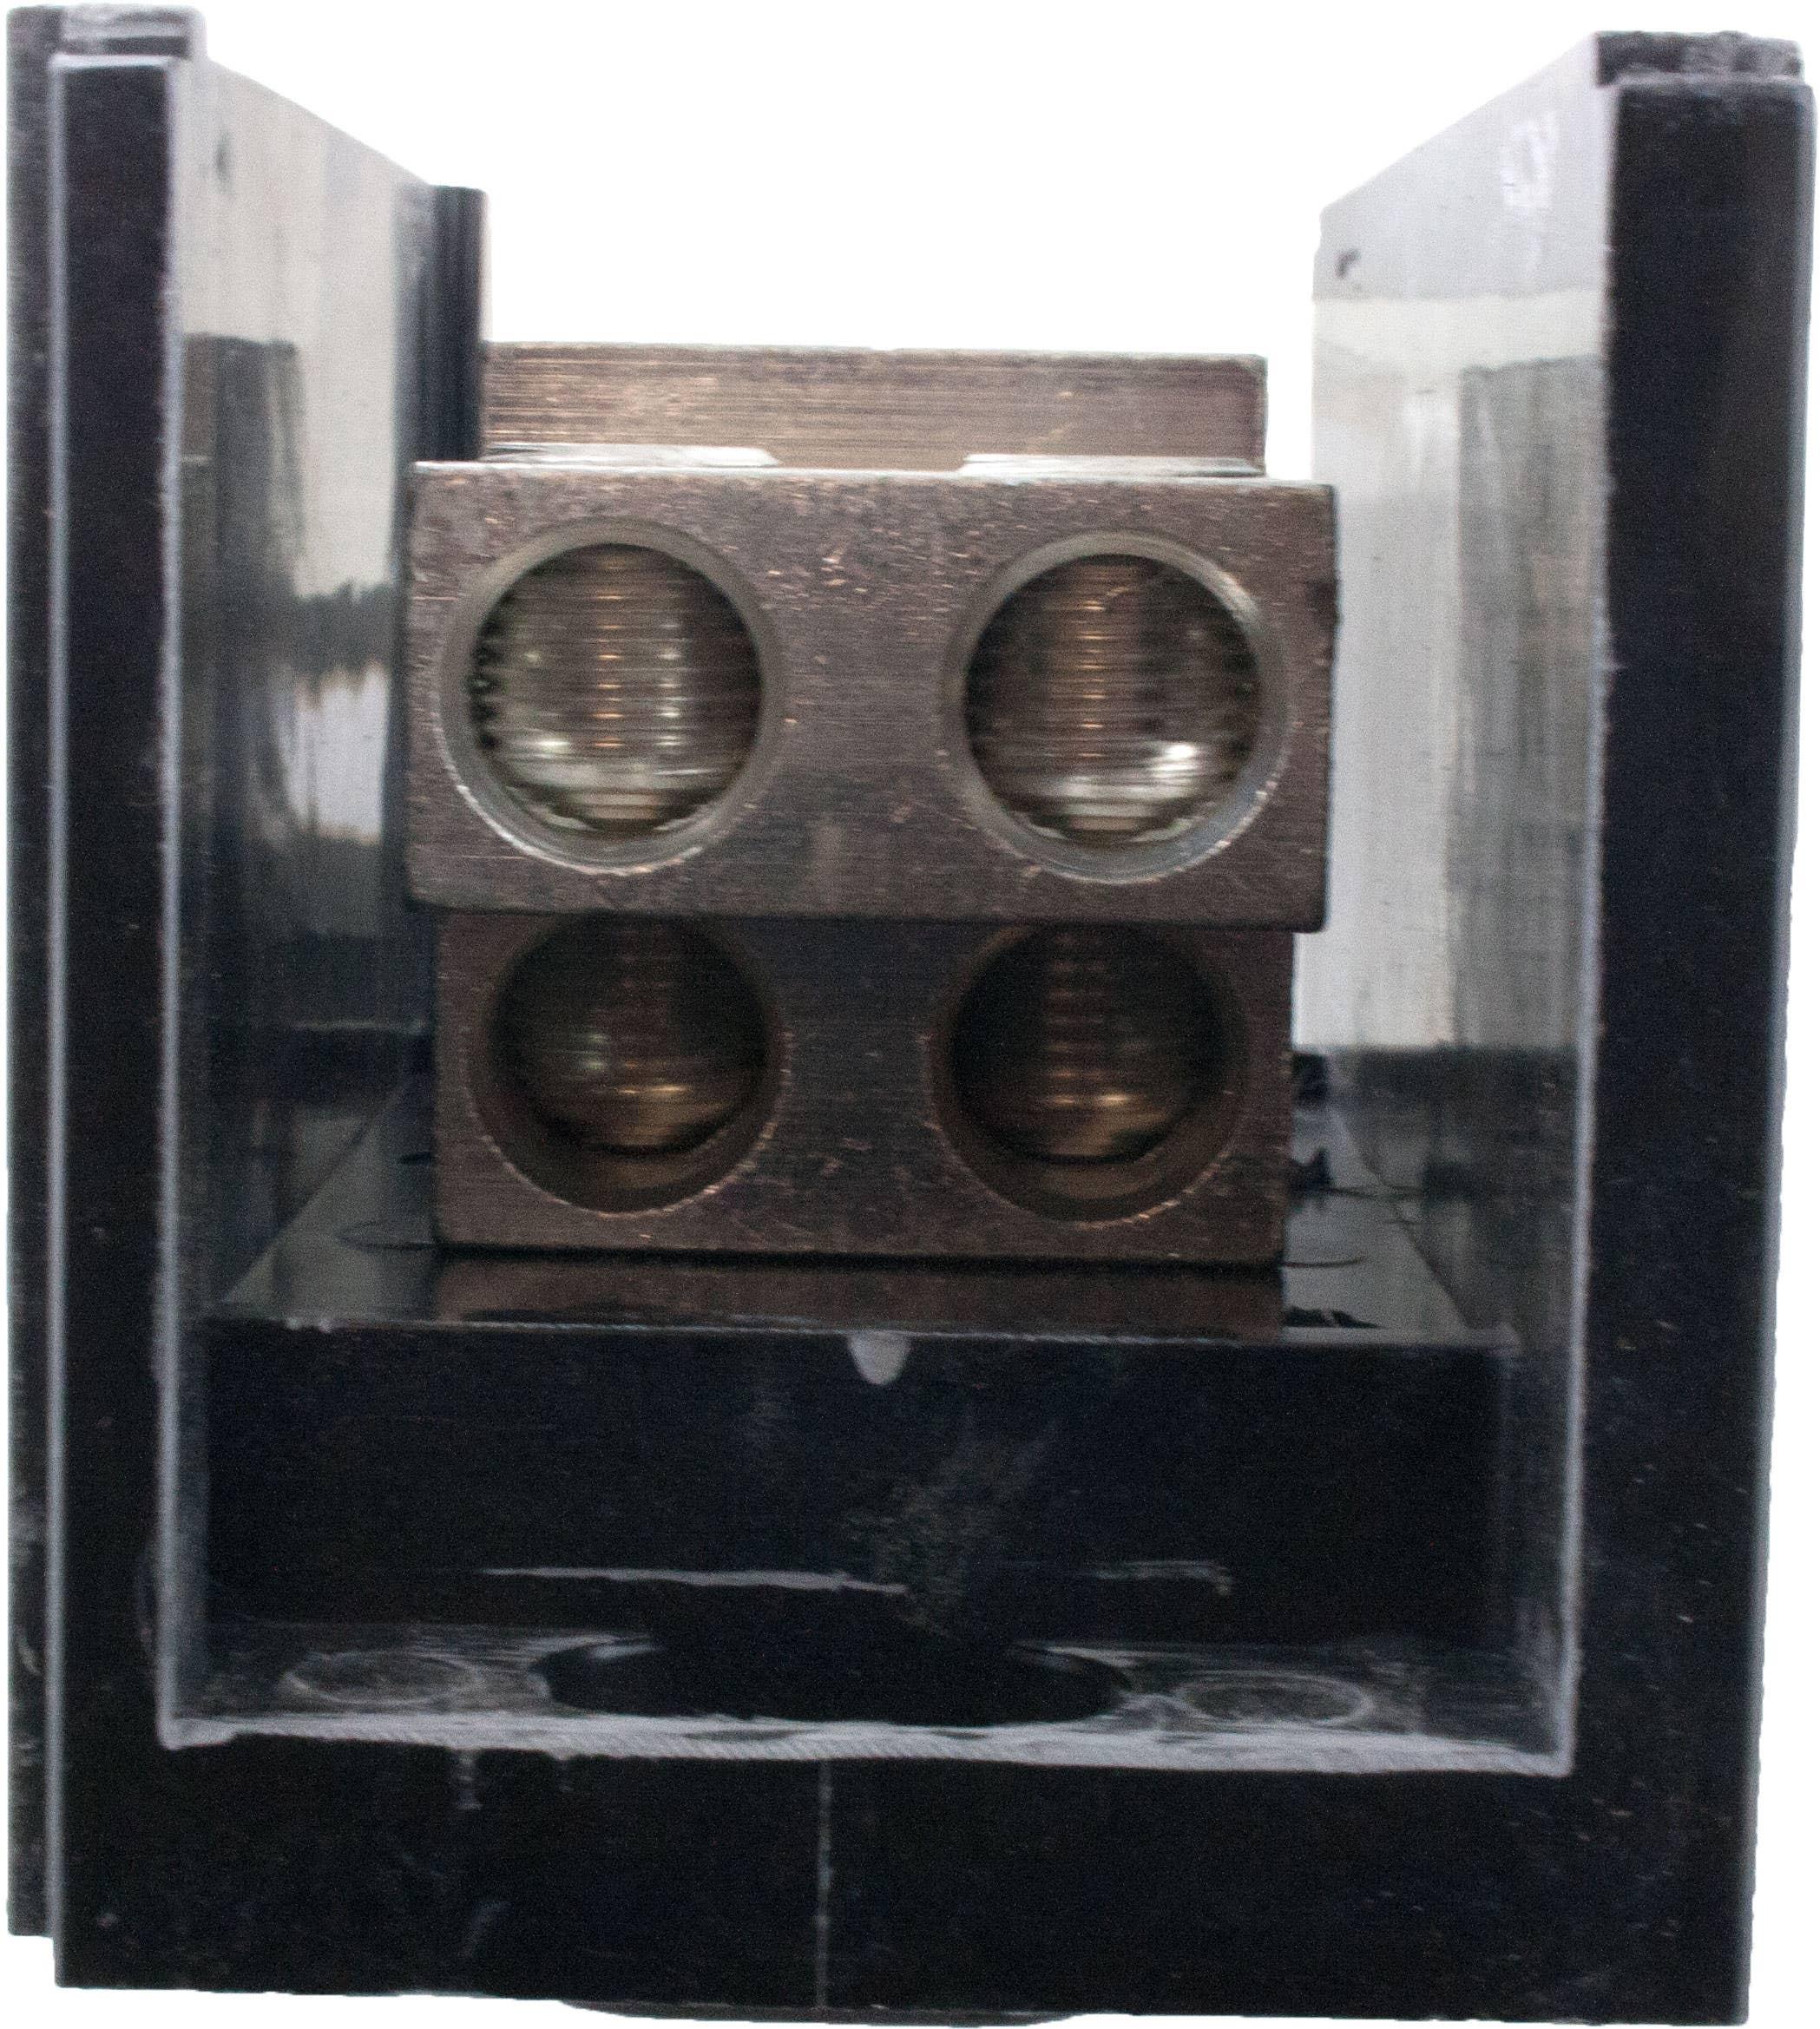 Power Distribution Blocks 4 500mcm Adb145001 Elecdirect Bulletin 500 Nema Top Wiring Contactors For Motor Loads